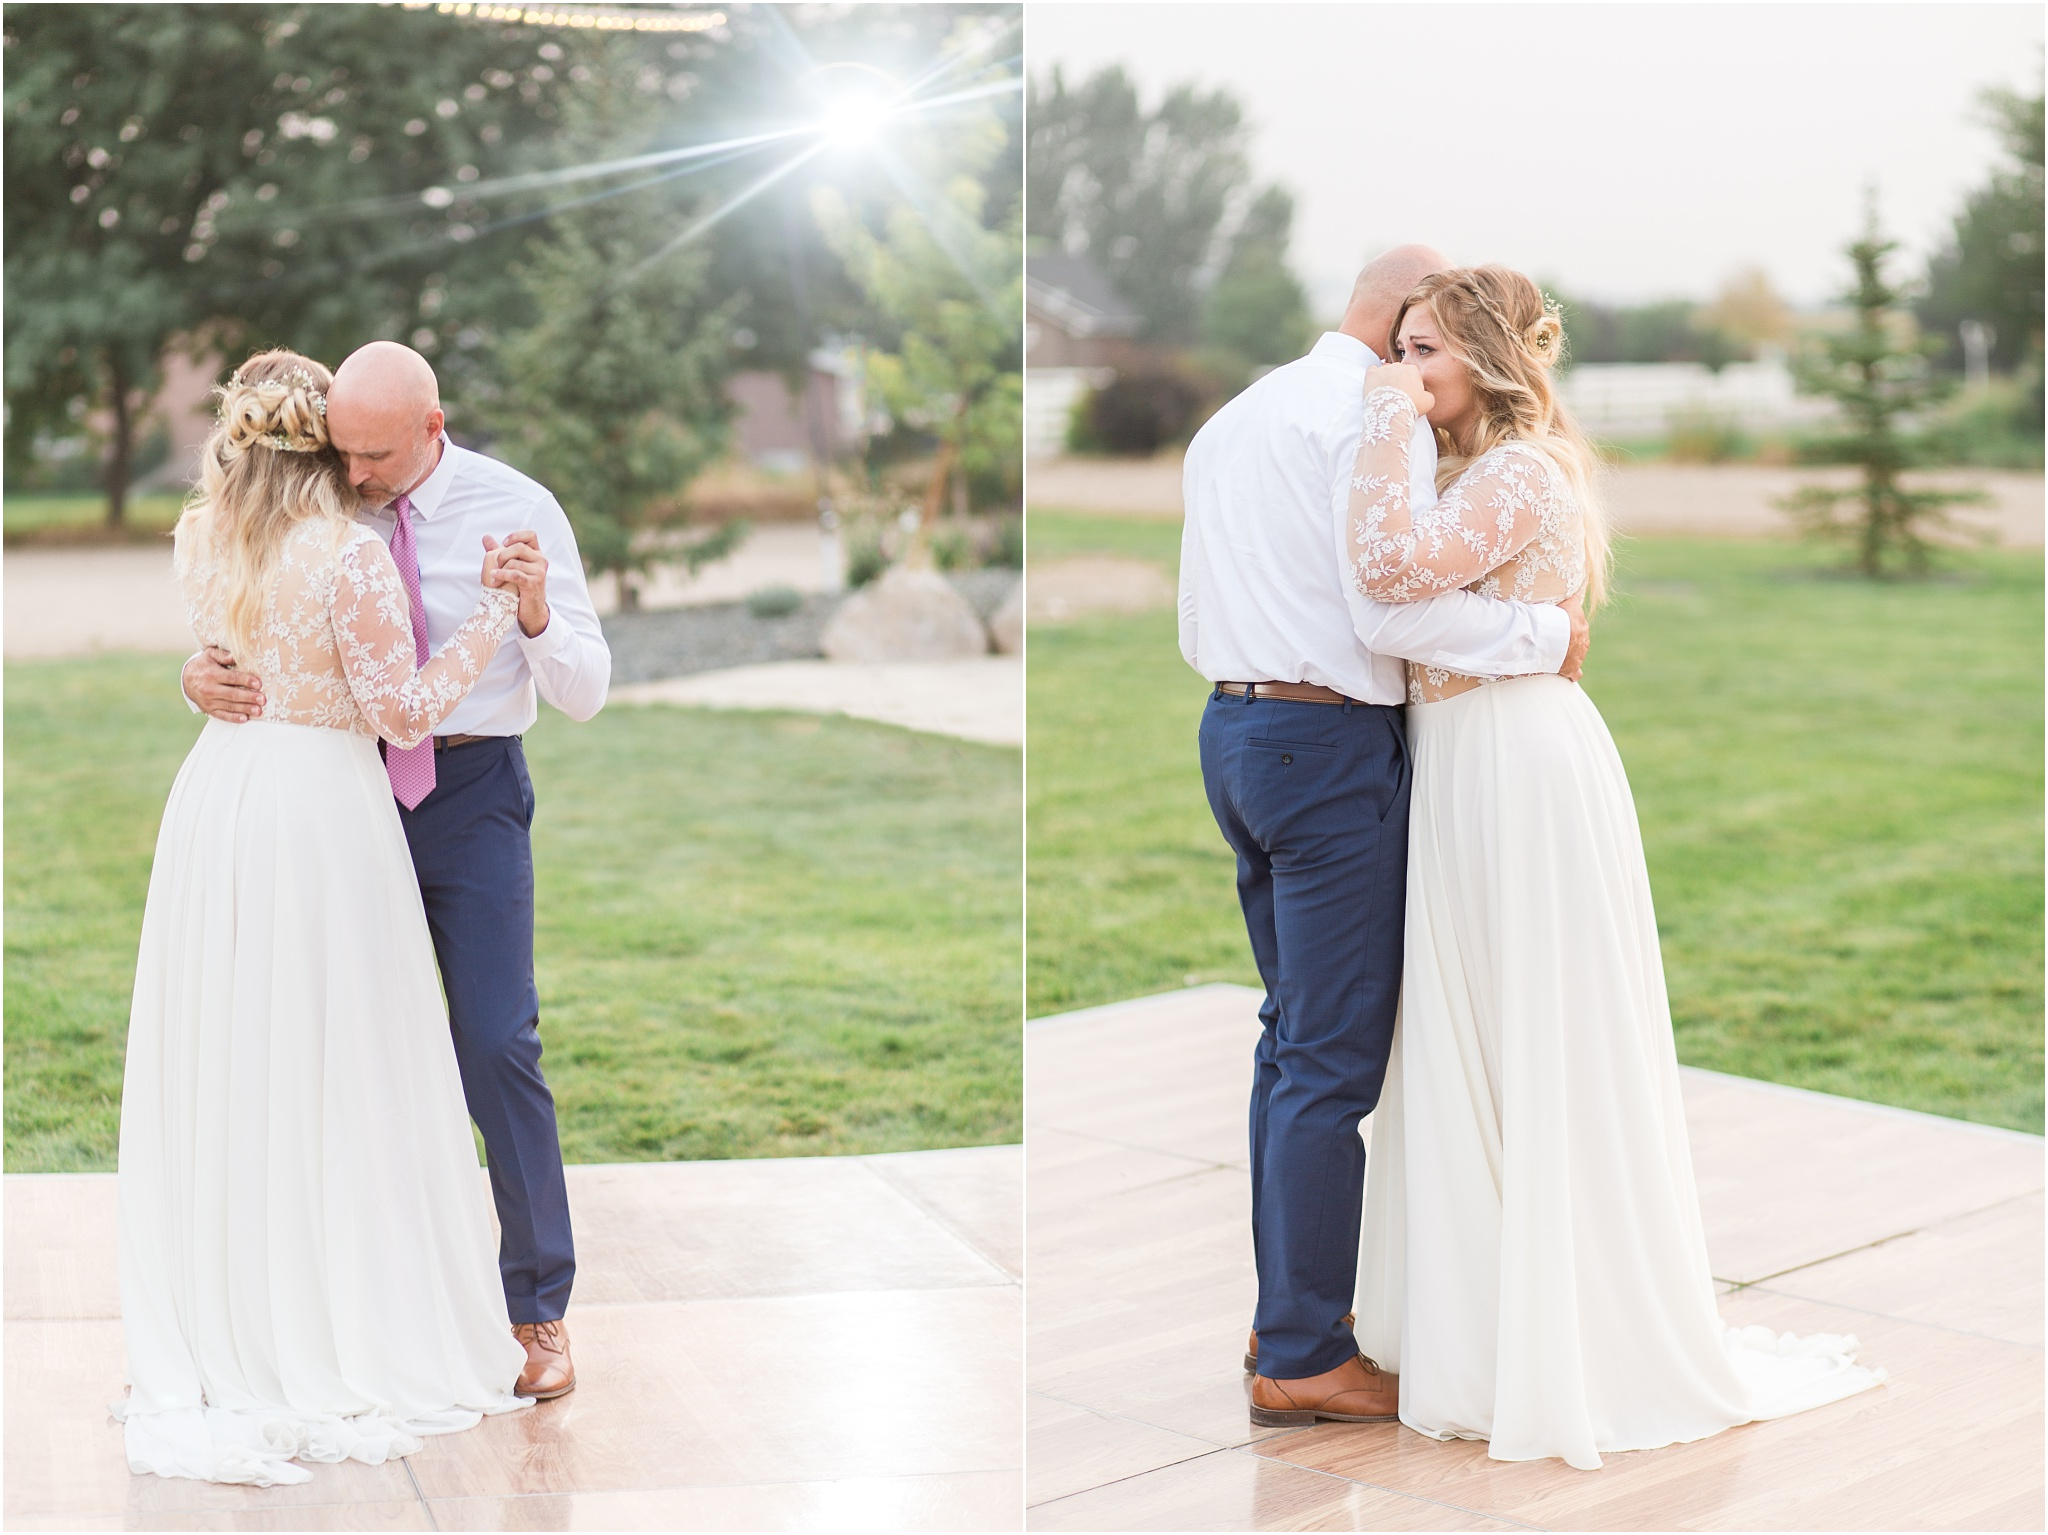 Wedding Photography_Meridian Idaho Temple_Boise Idaho_Nampa Idaho_Leah Southwick Photography_0058.jpg